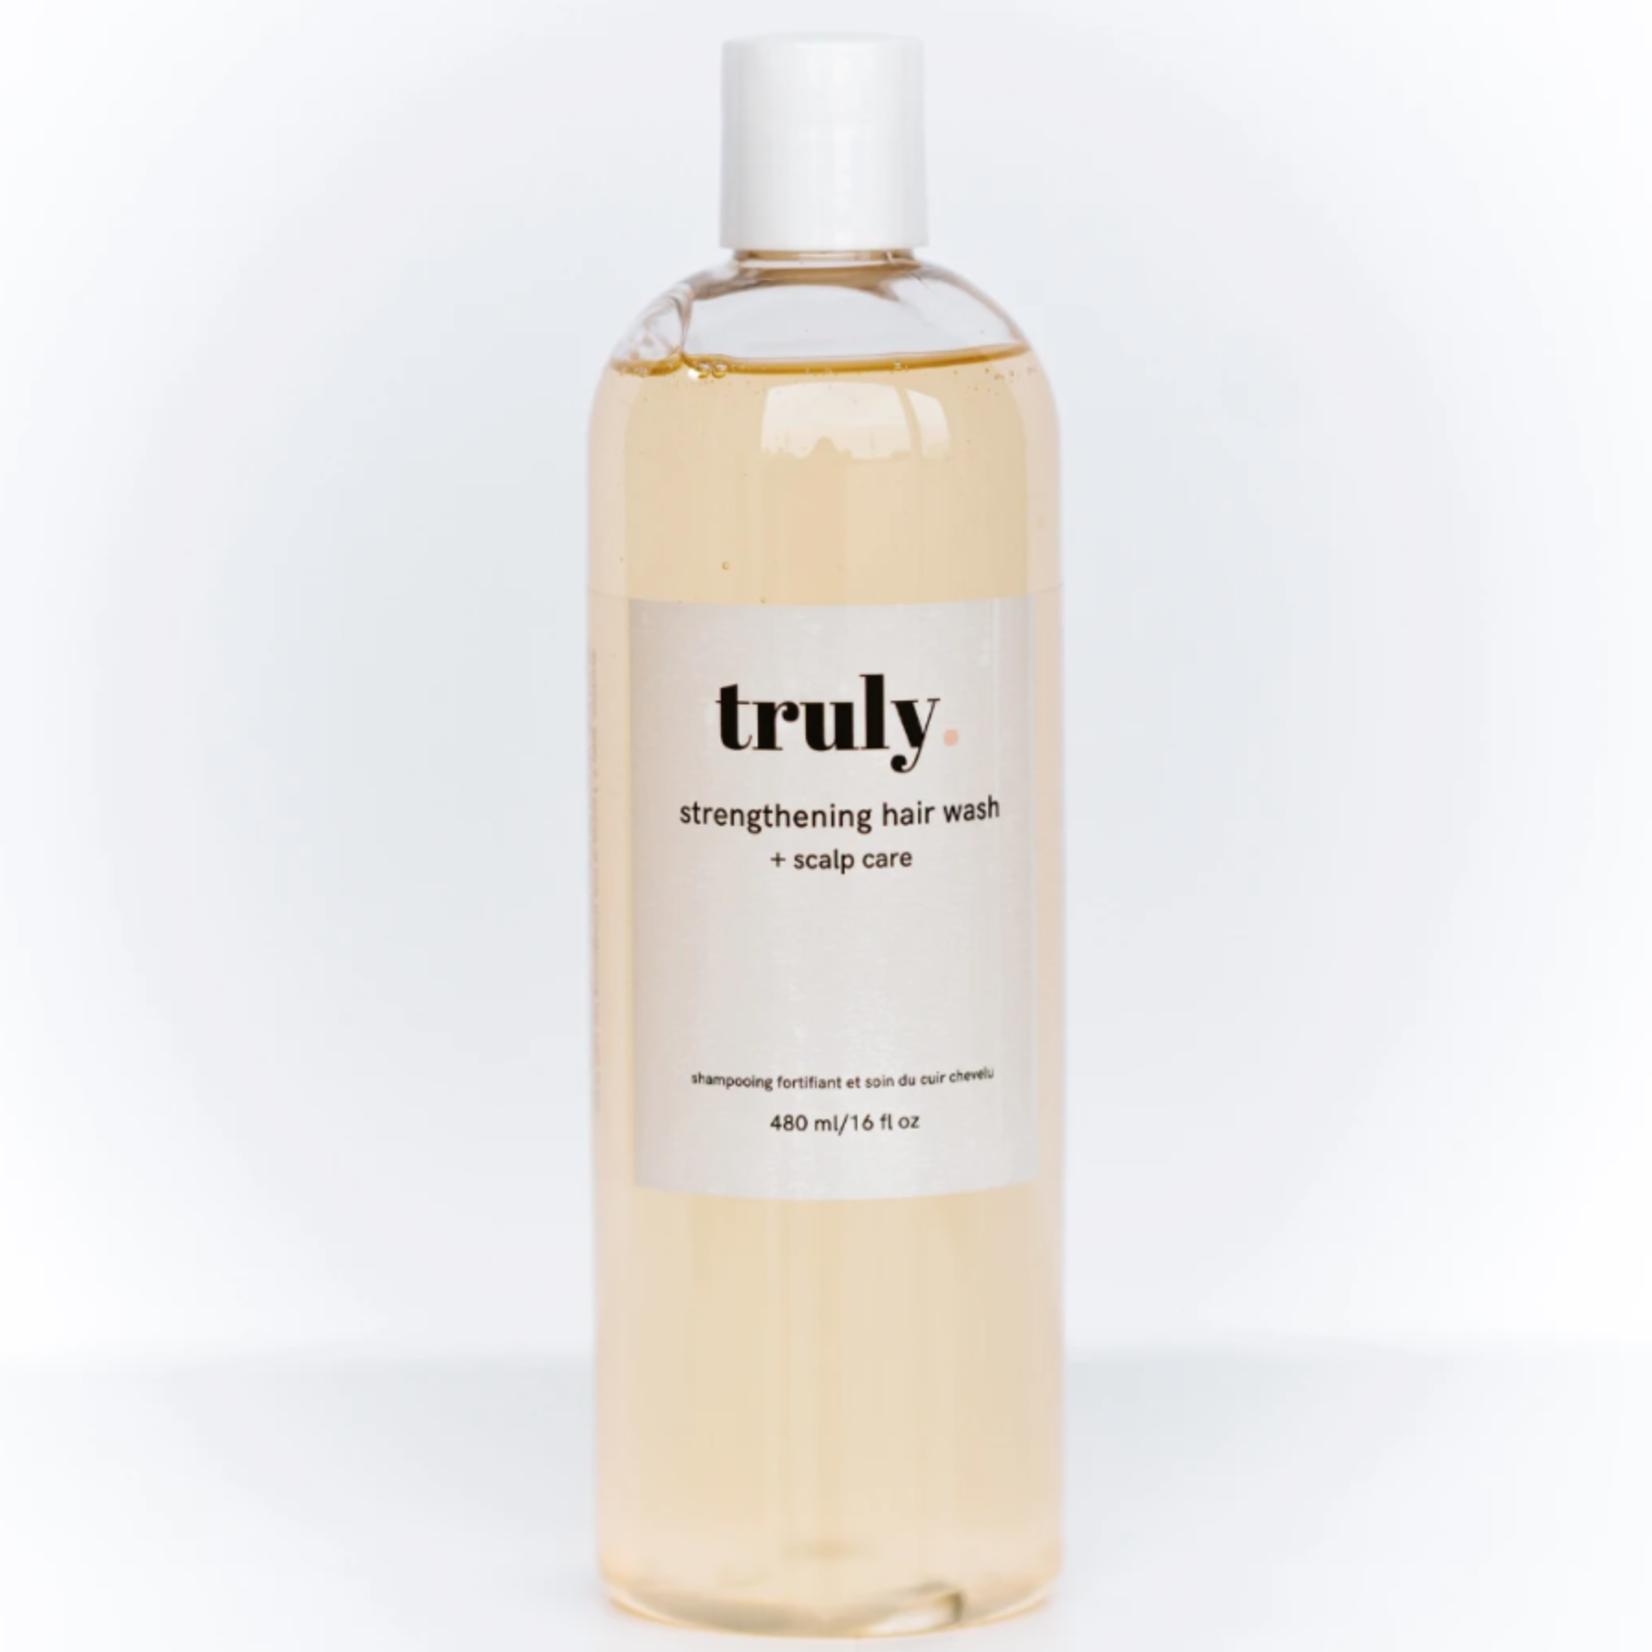 Truly lifestylebrand Shampoing  fortifiant + soin du cuir chelevu